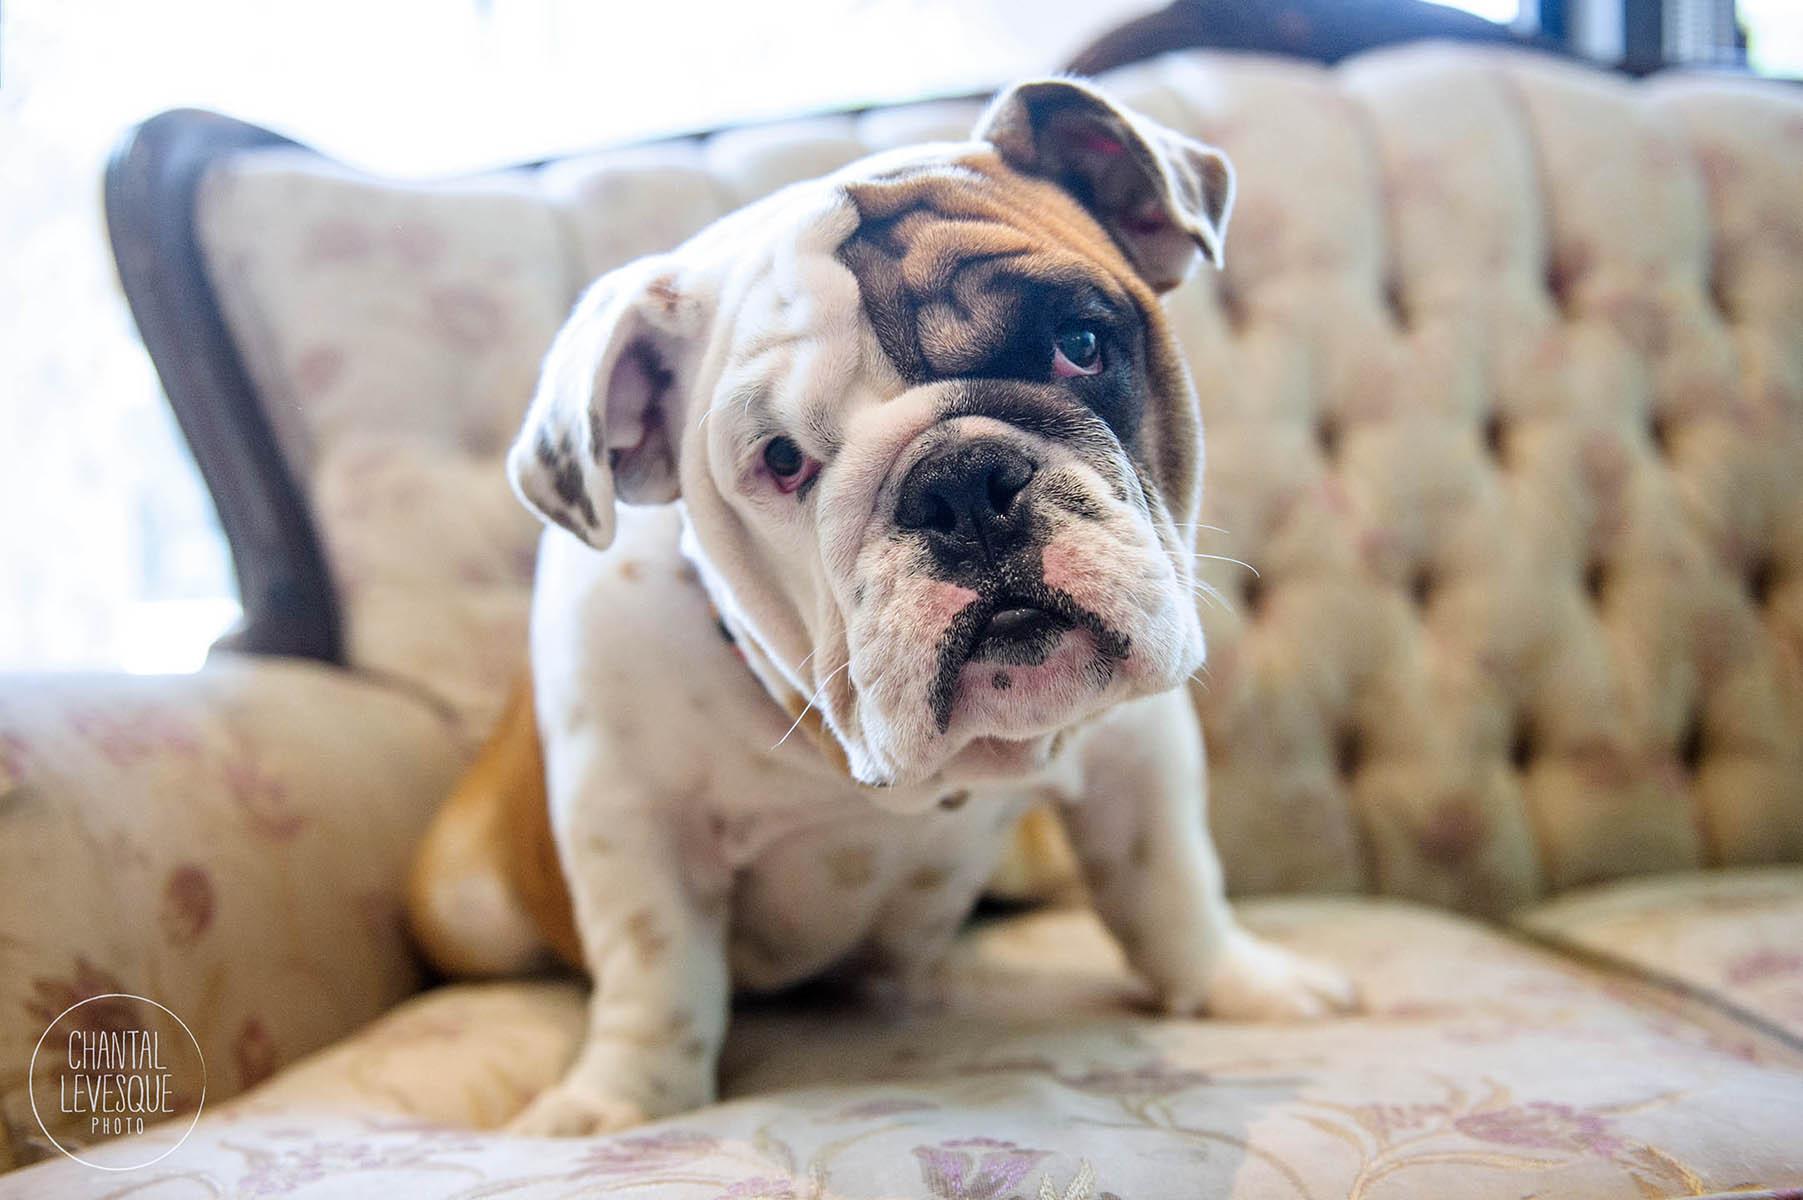 doggy-casting-bulldogs-5719.jpg